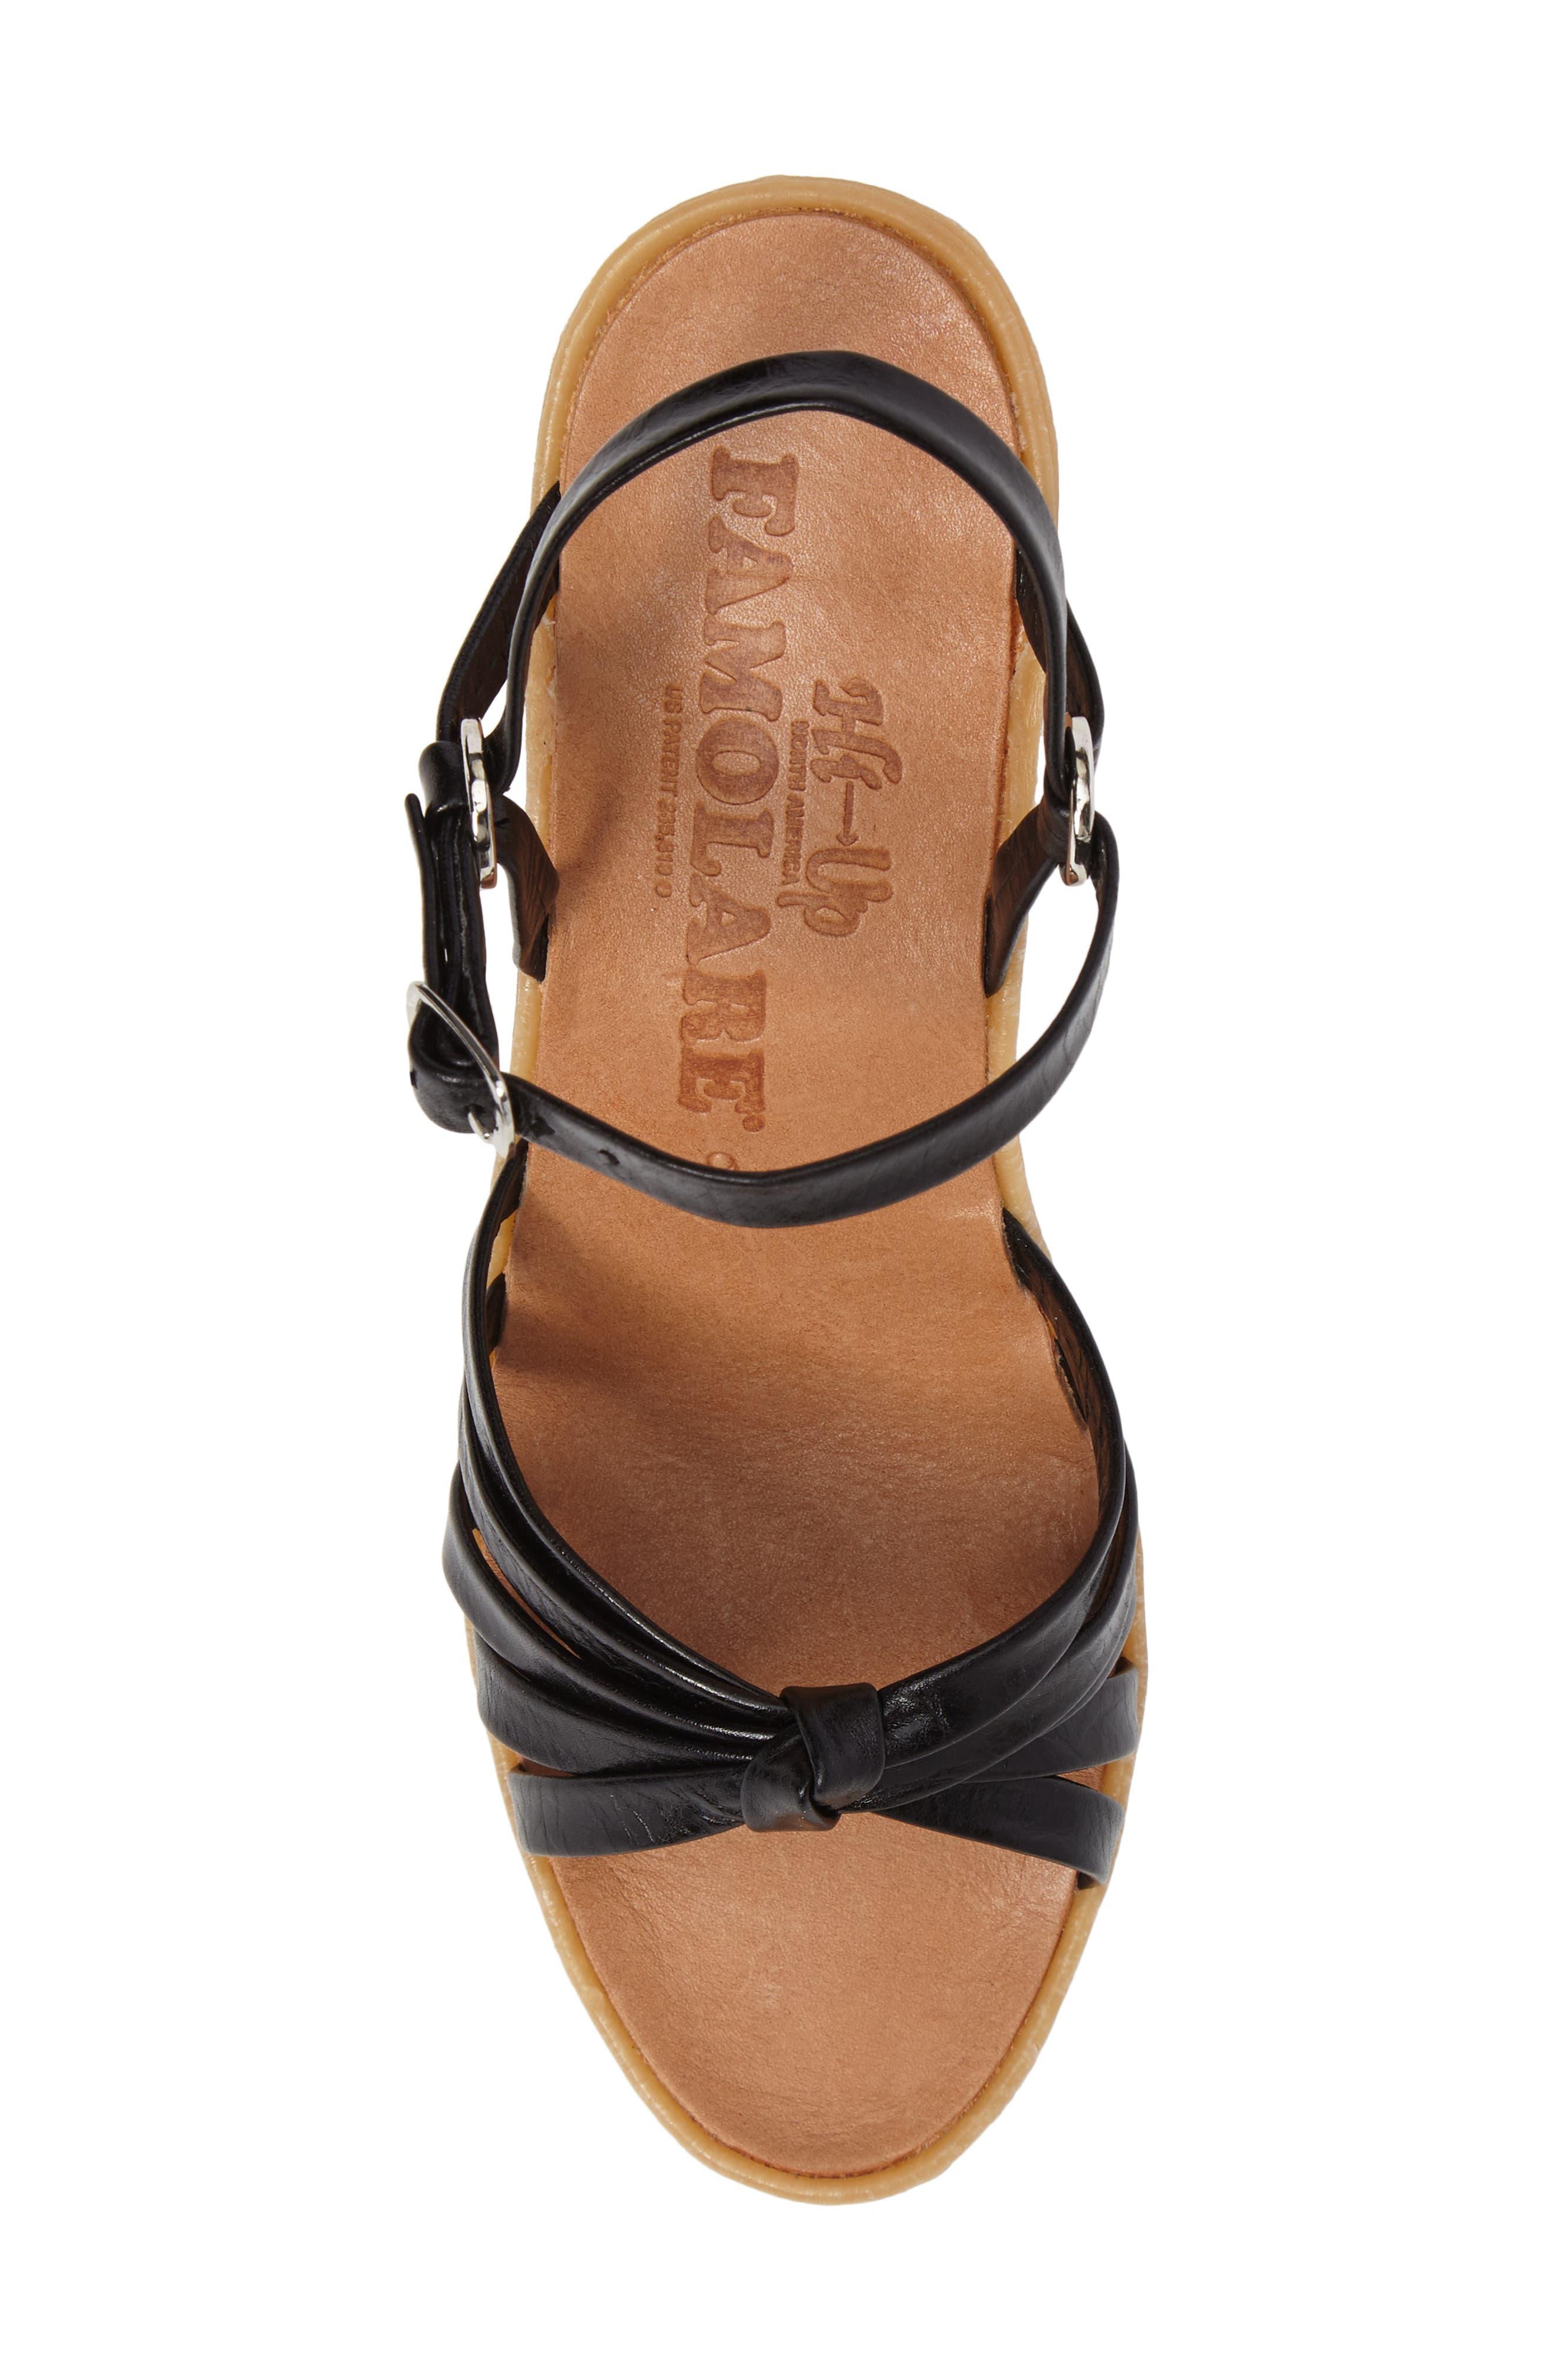 Knotty Monkey Wedge Sandal,                             Alternate thumbnail 5, color,                             Coal Leather